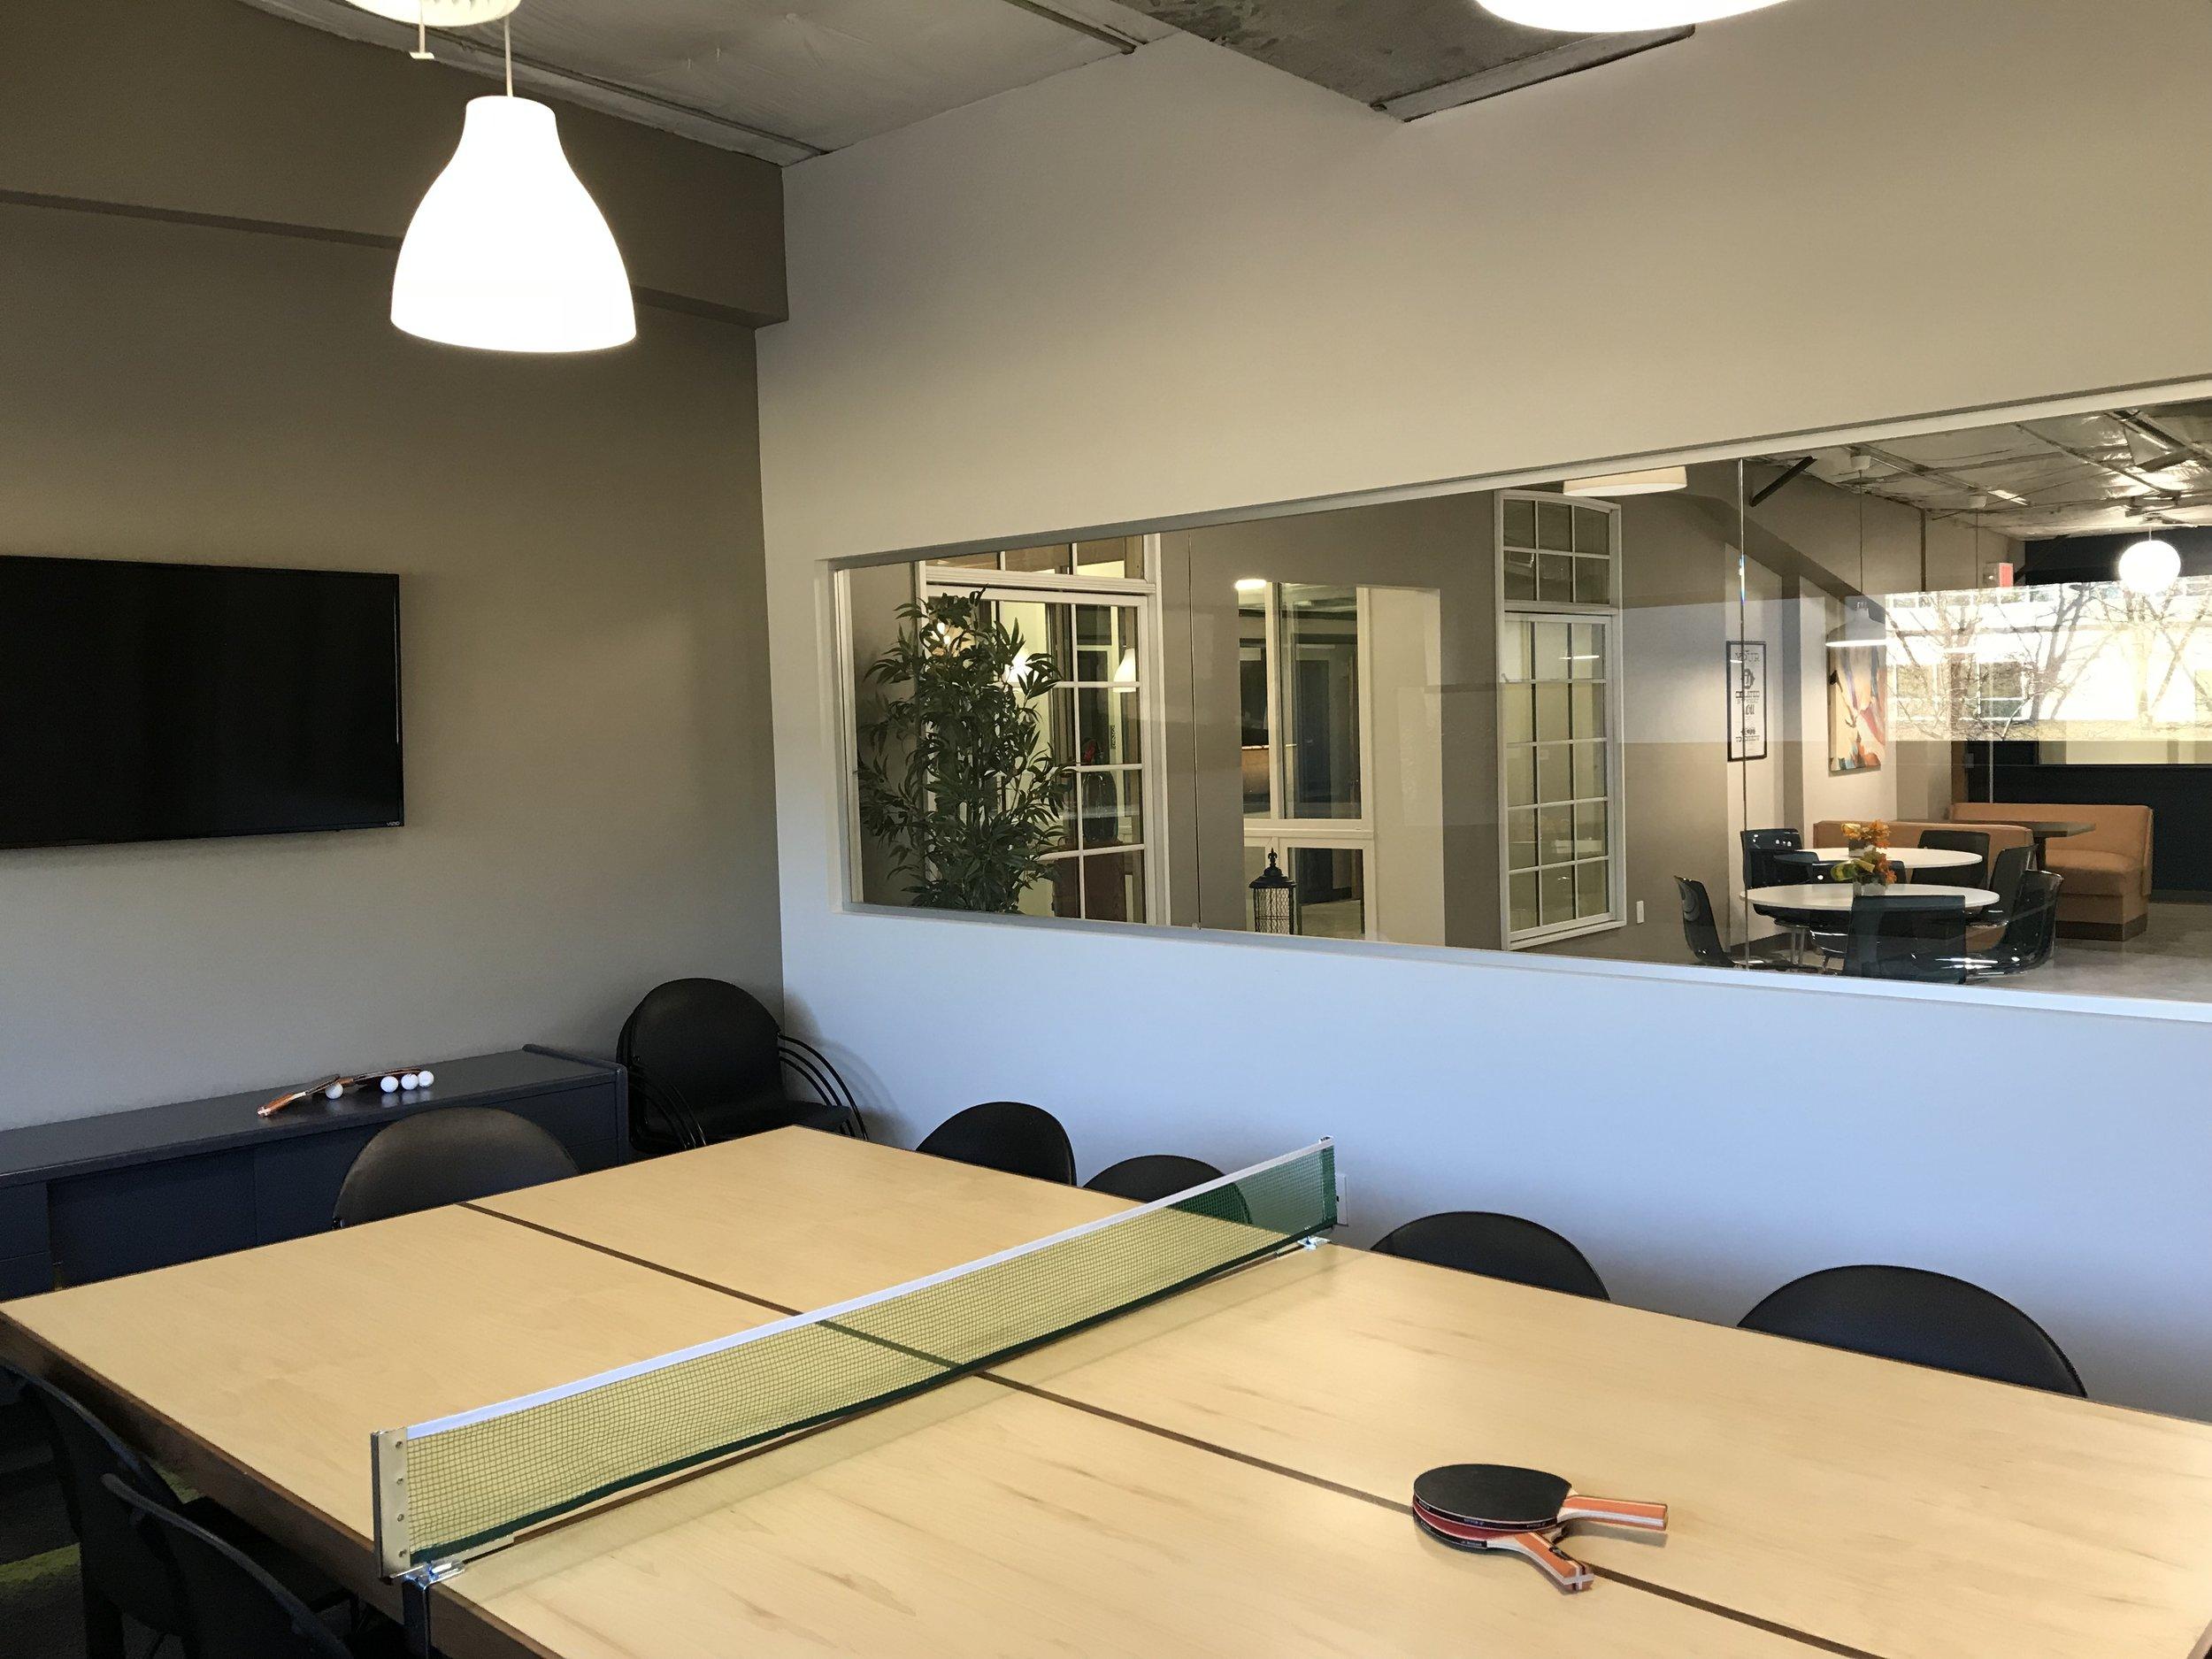 lg conference room.jpg